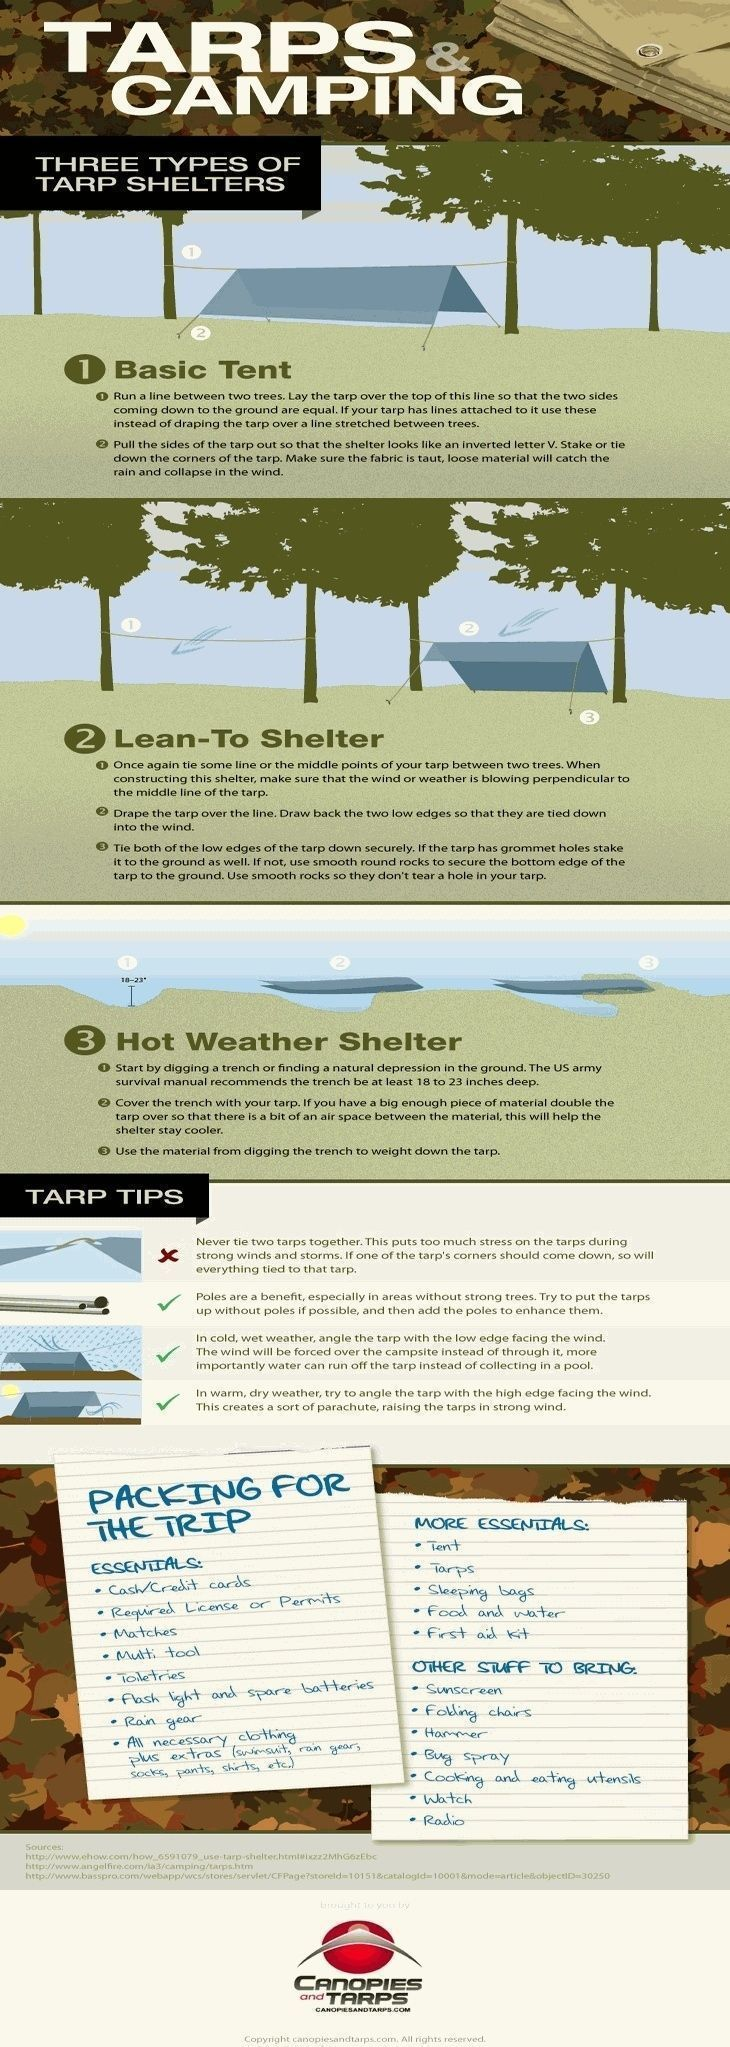 Disaster Preparedness - Camping In The Rain | Rain Gear Checklist and DIY Shelter by Survival Life survivallife.com/...